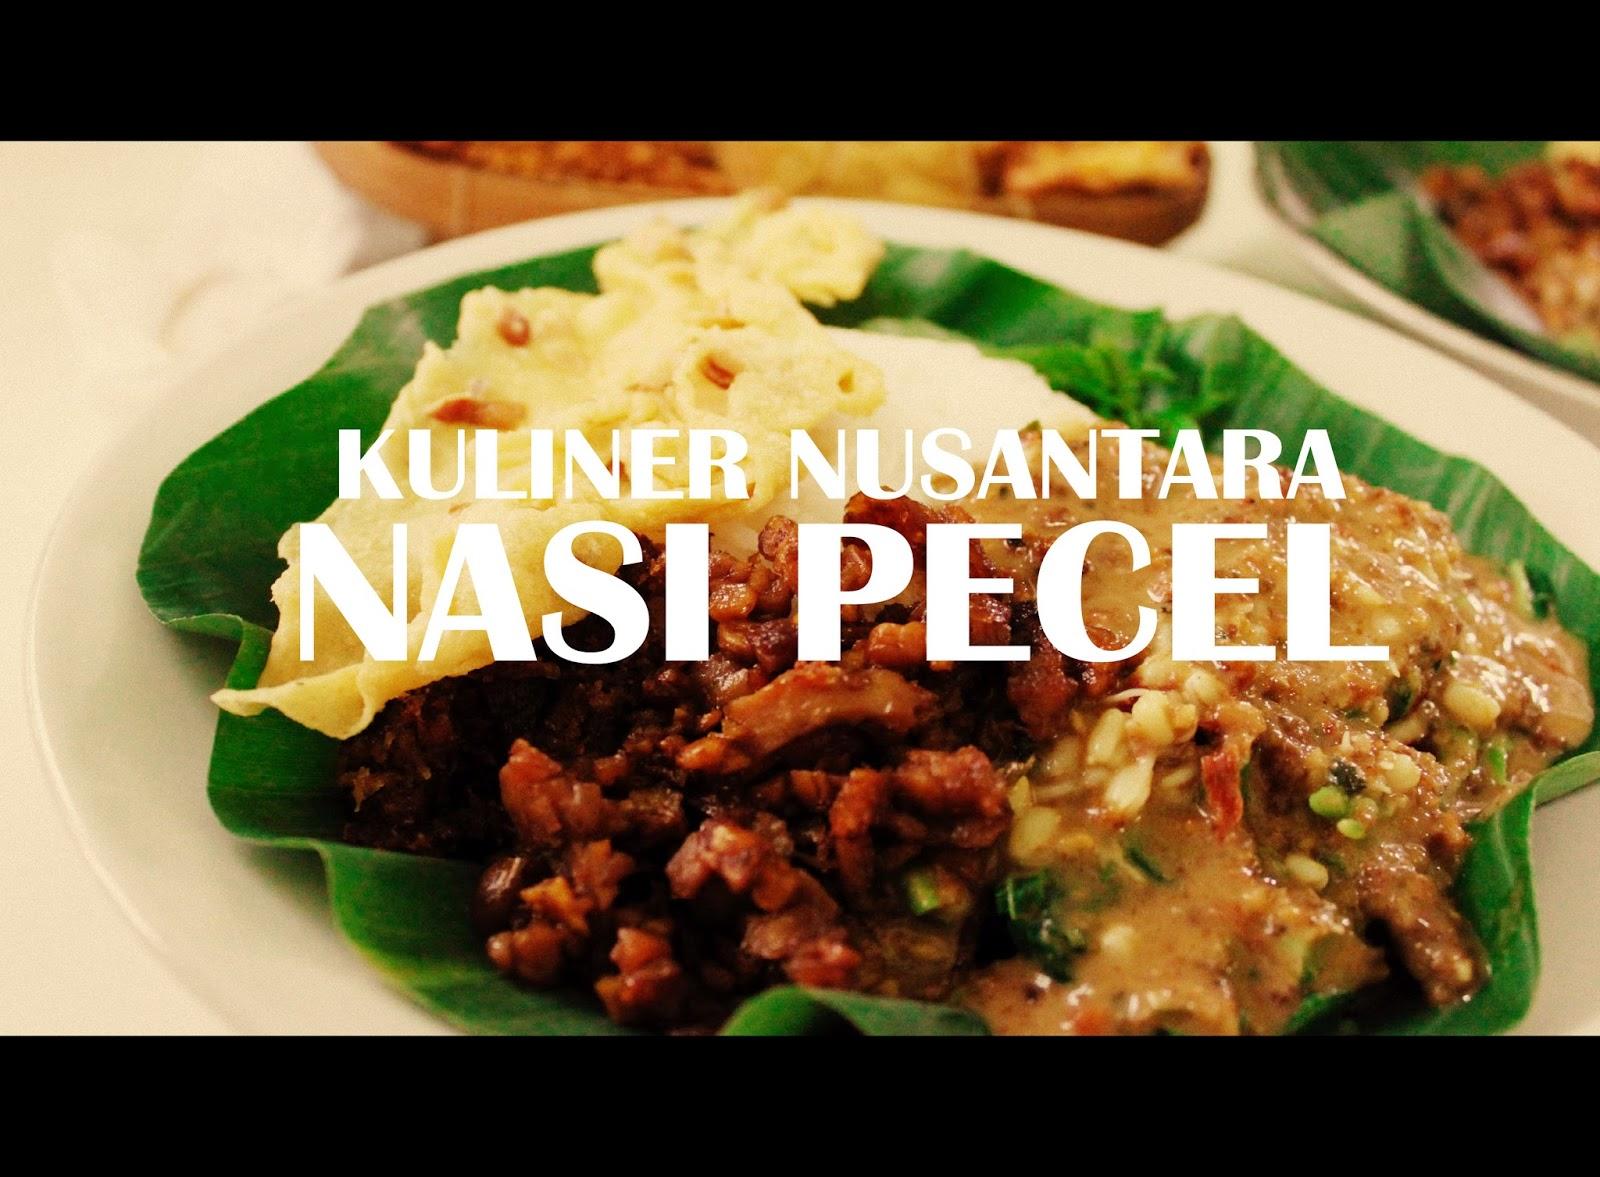 Kuliner Nusantara Nasi Pecel Negeriku Indonesia